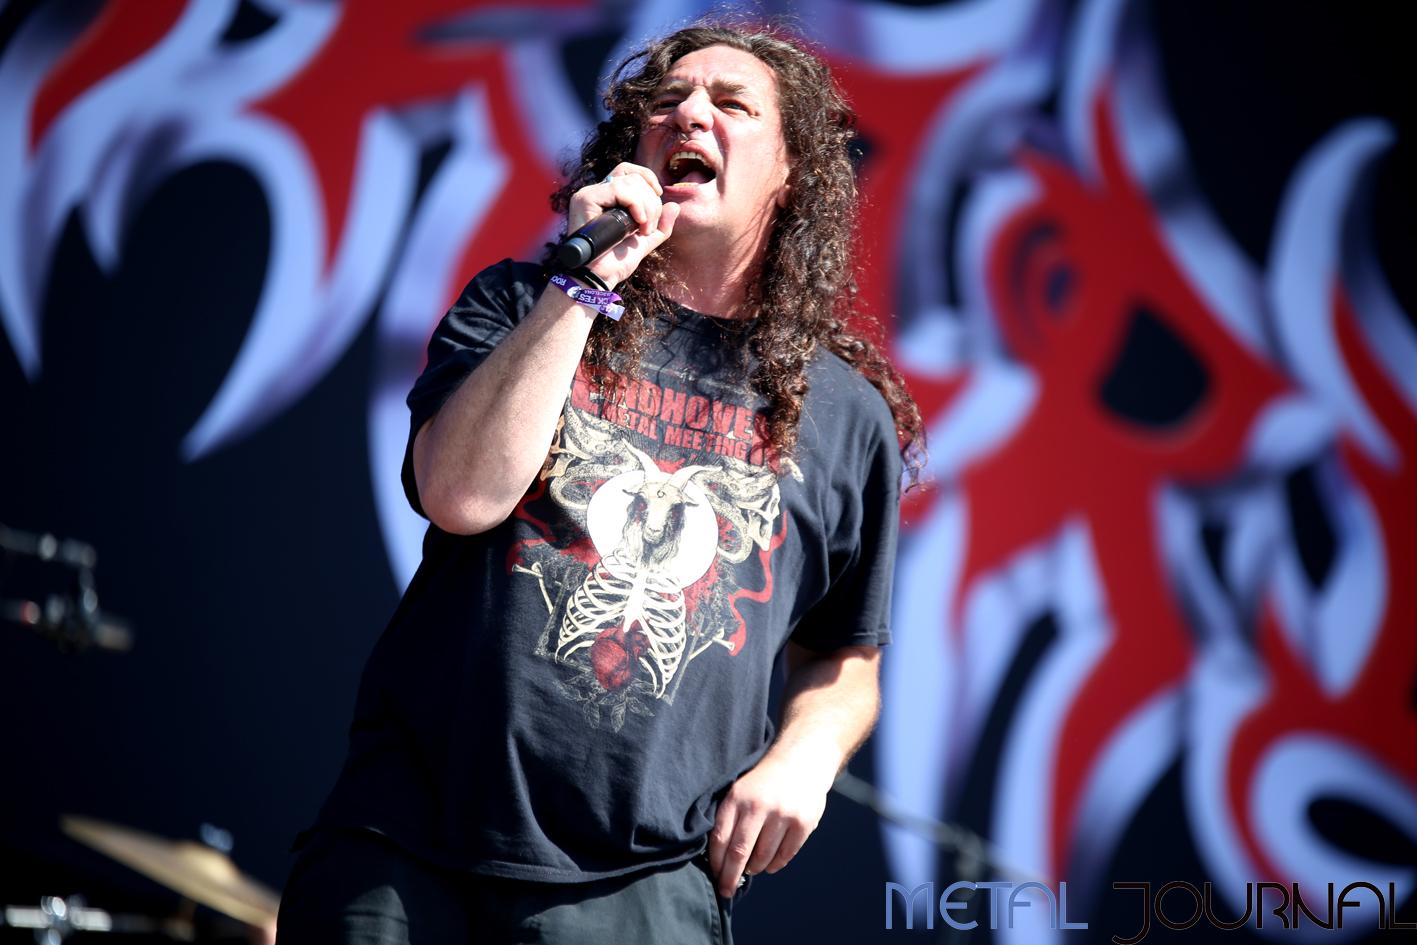 tankard rock fest 18 - metal journal pic 3